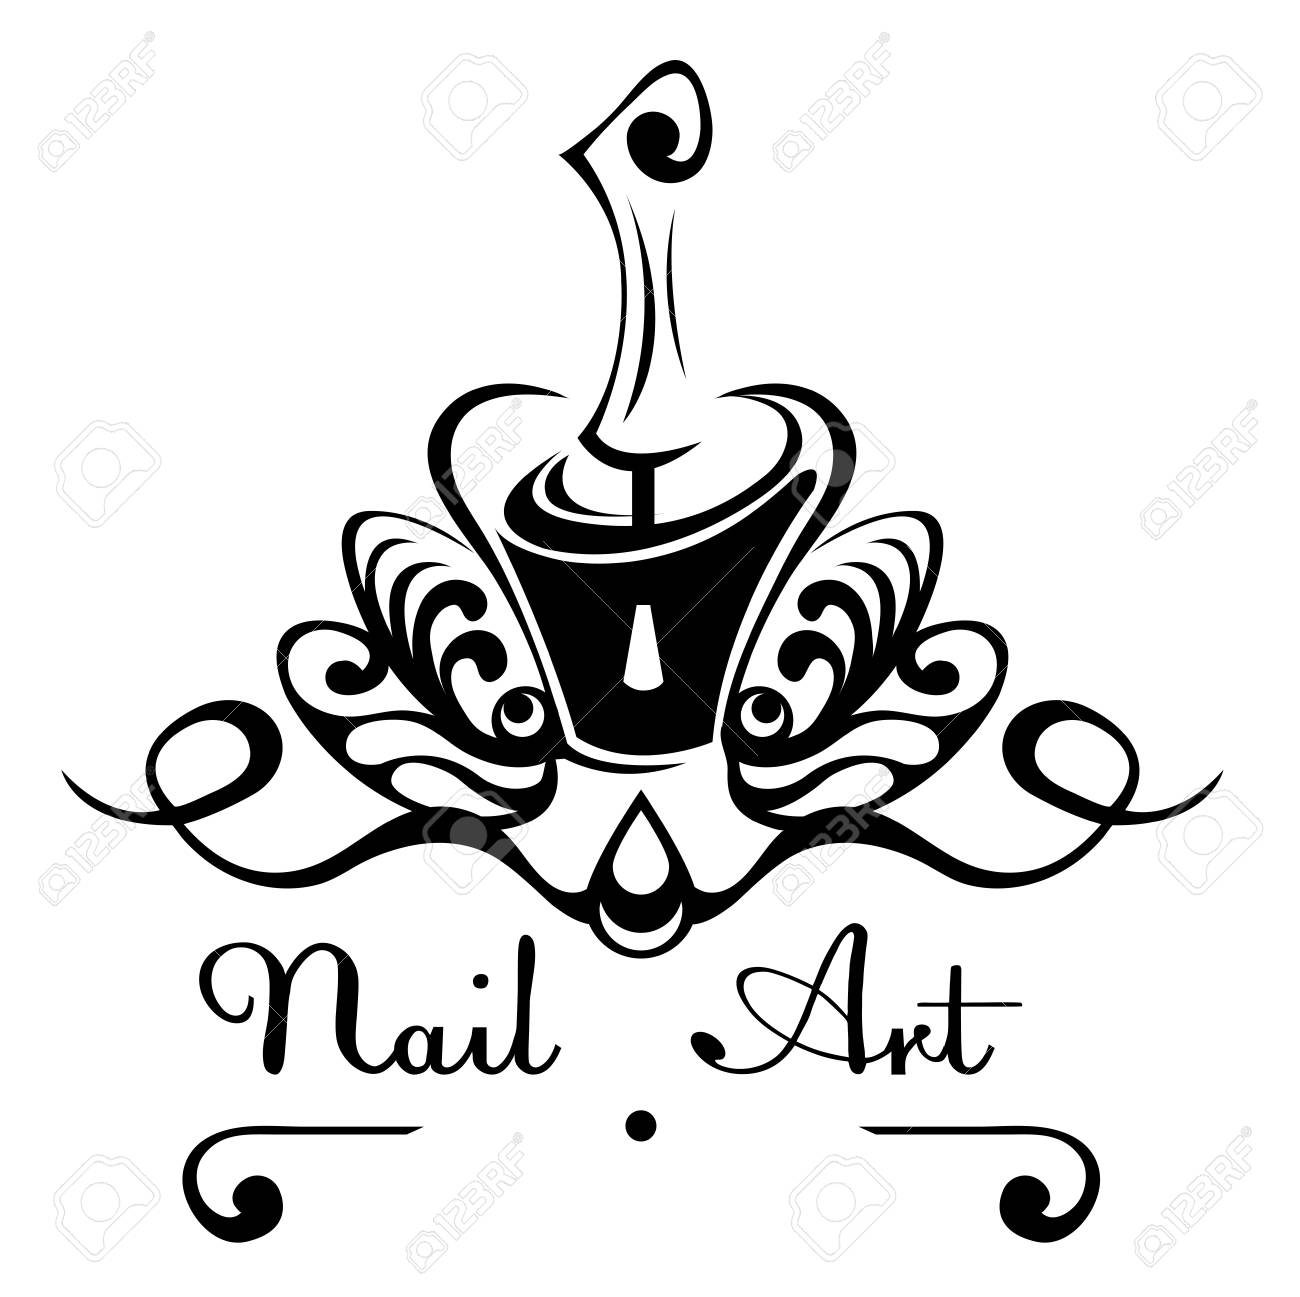 98 Black And White Nail Polish Bottle Clip Art Black Diamond Nail